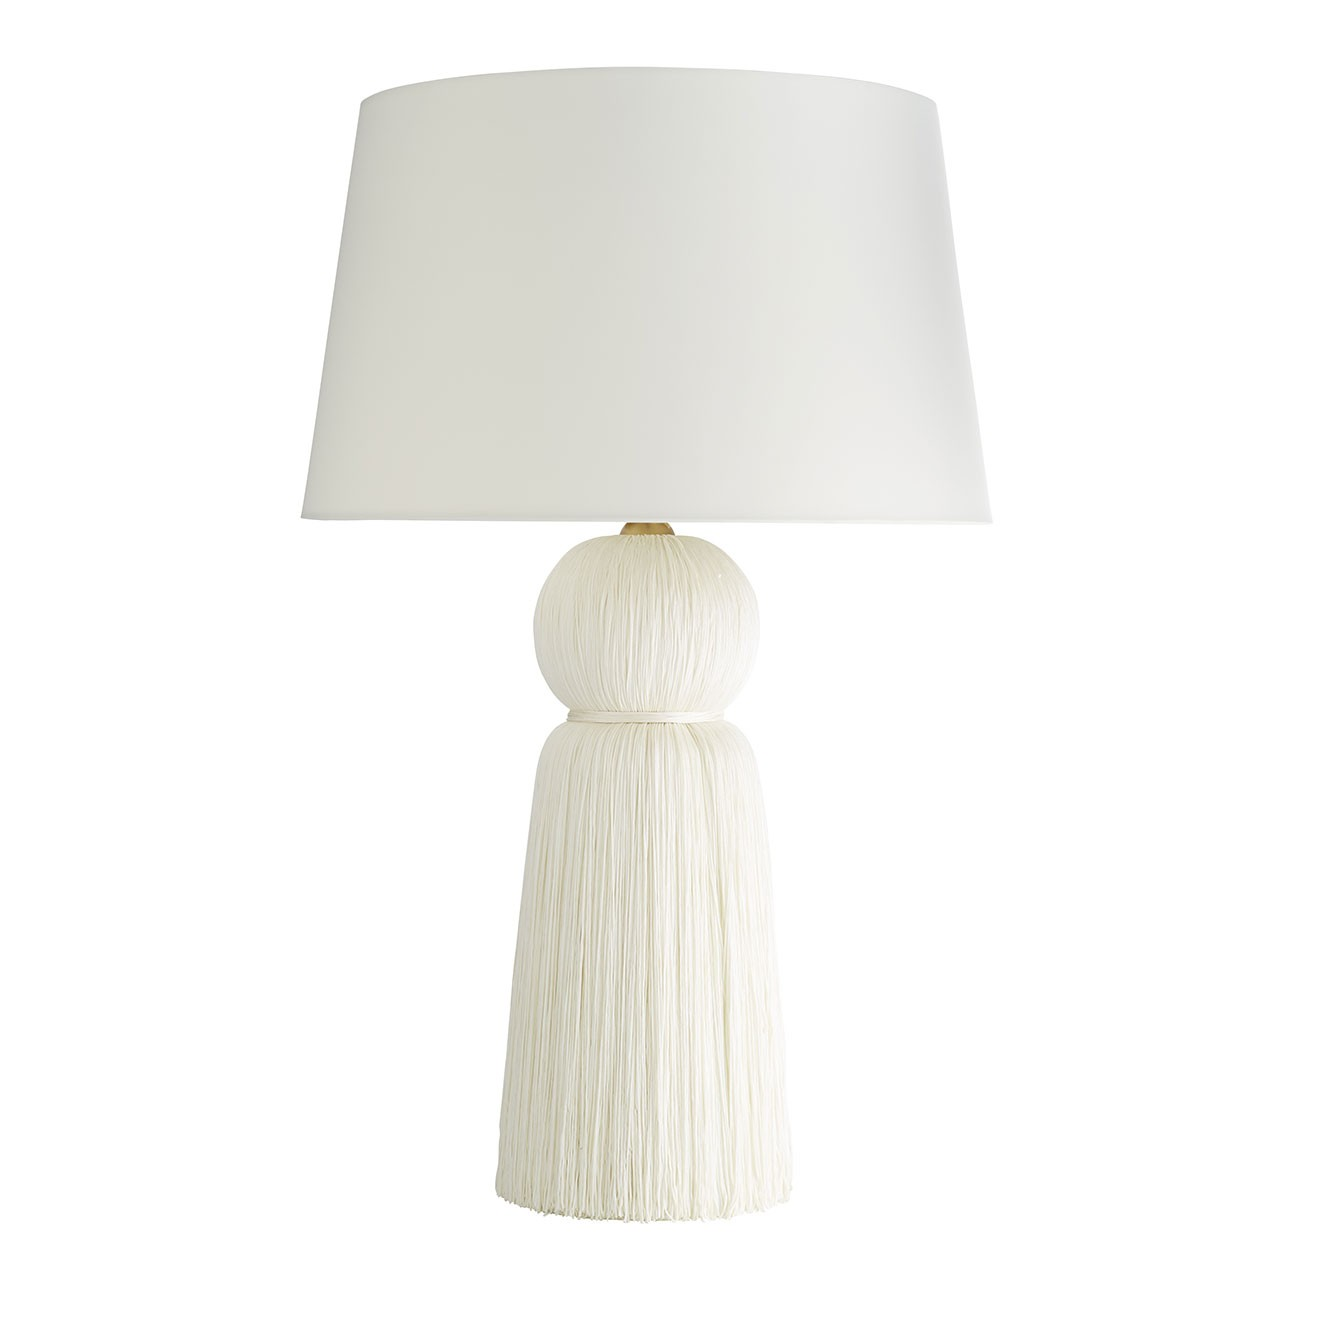 Pulp Home - Tassel Lamp - Cream Tassel Accented Table Lamp, Modern Feminine Lighting